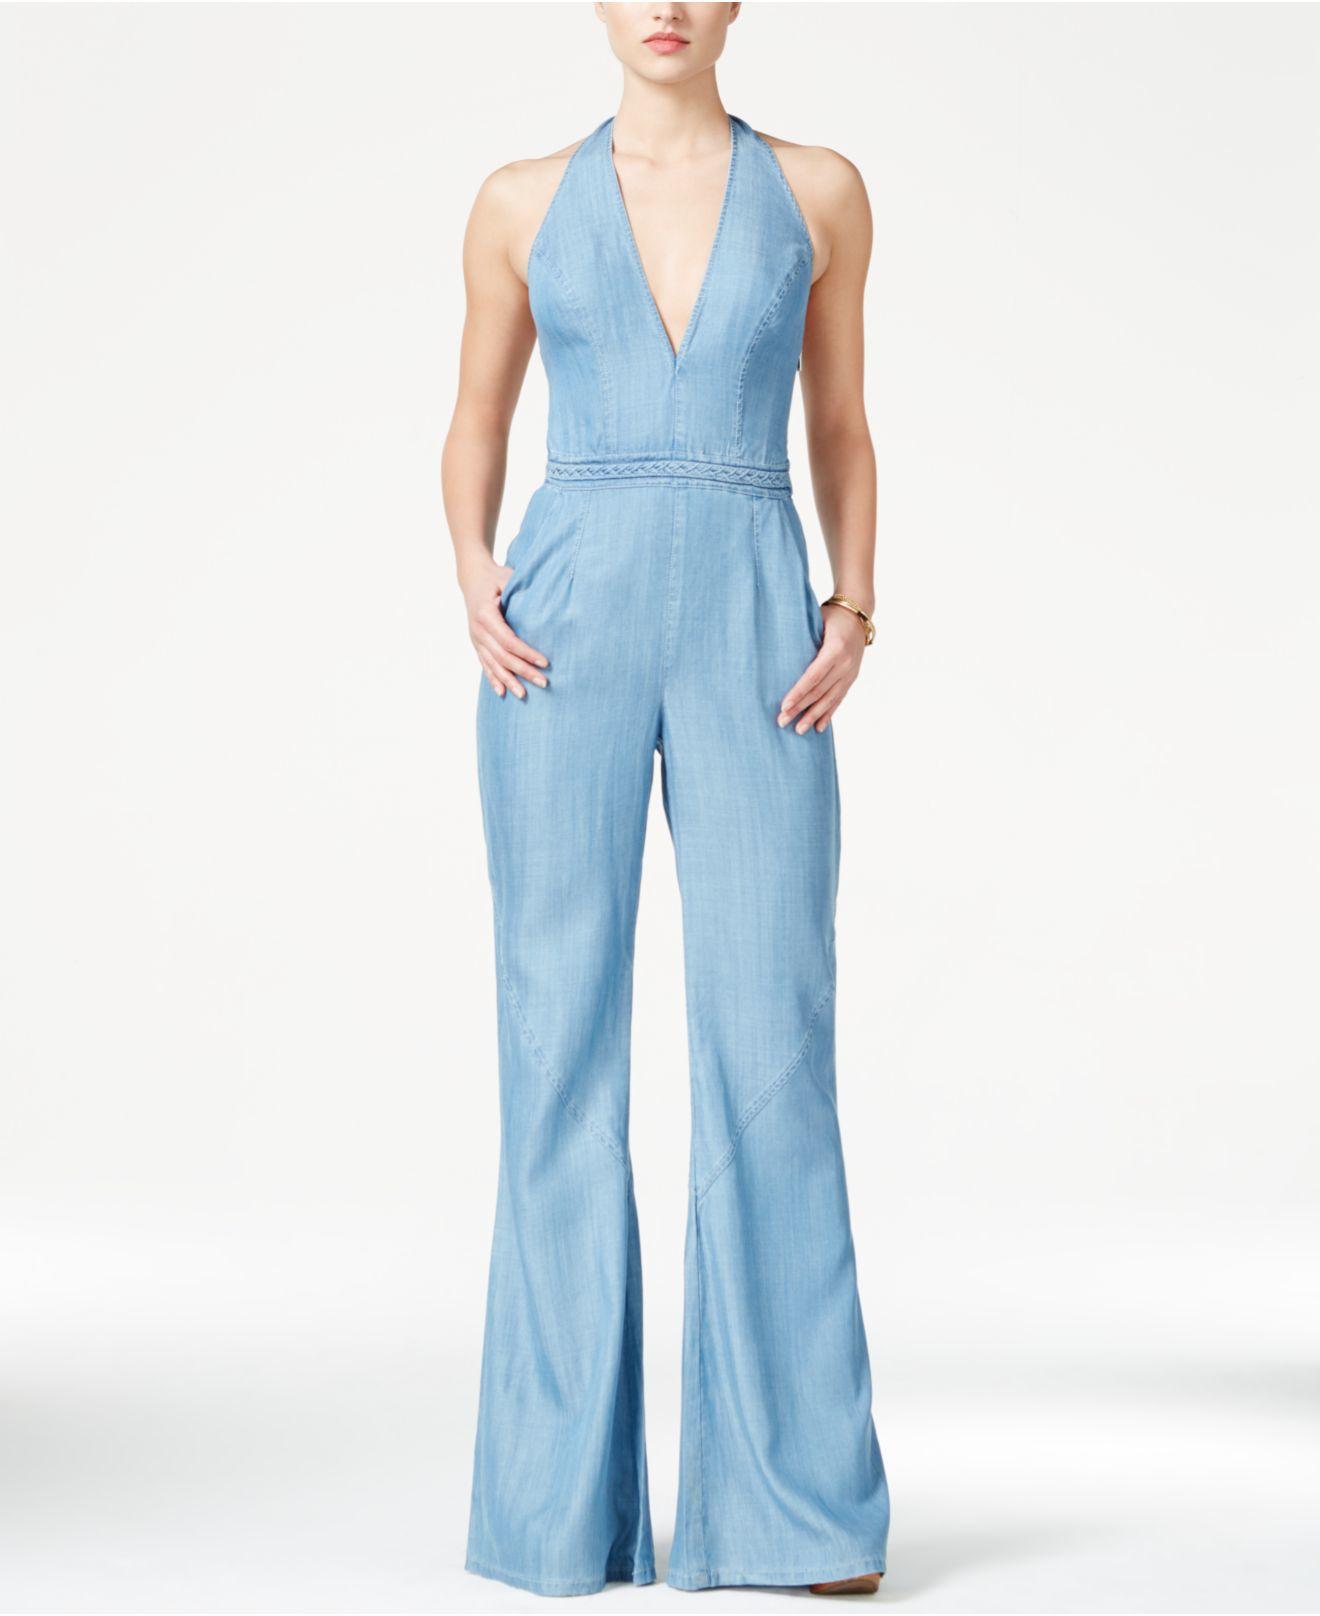 01064320e92 Lyst - Guess Wide-leg Denim Halter Jumpsuit in Blue